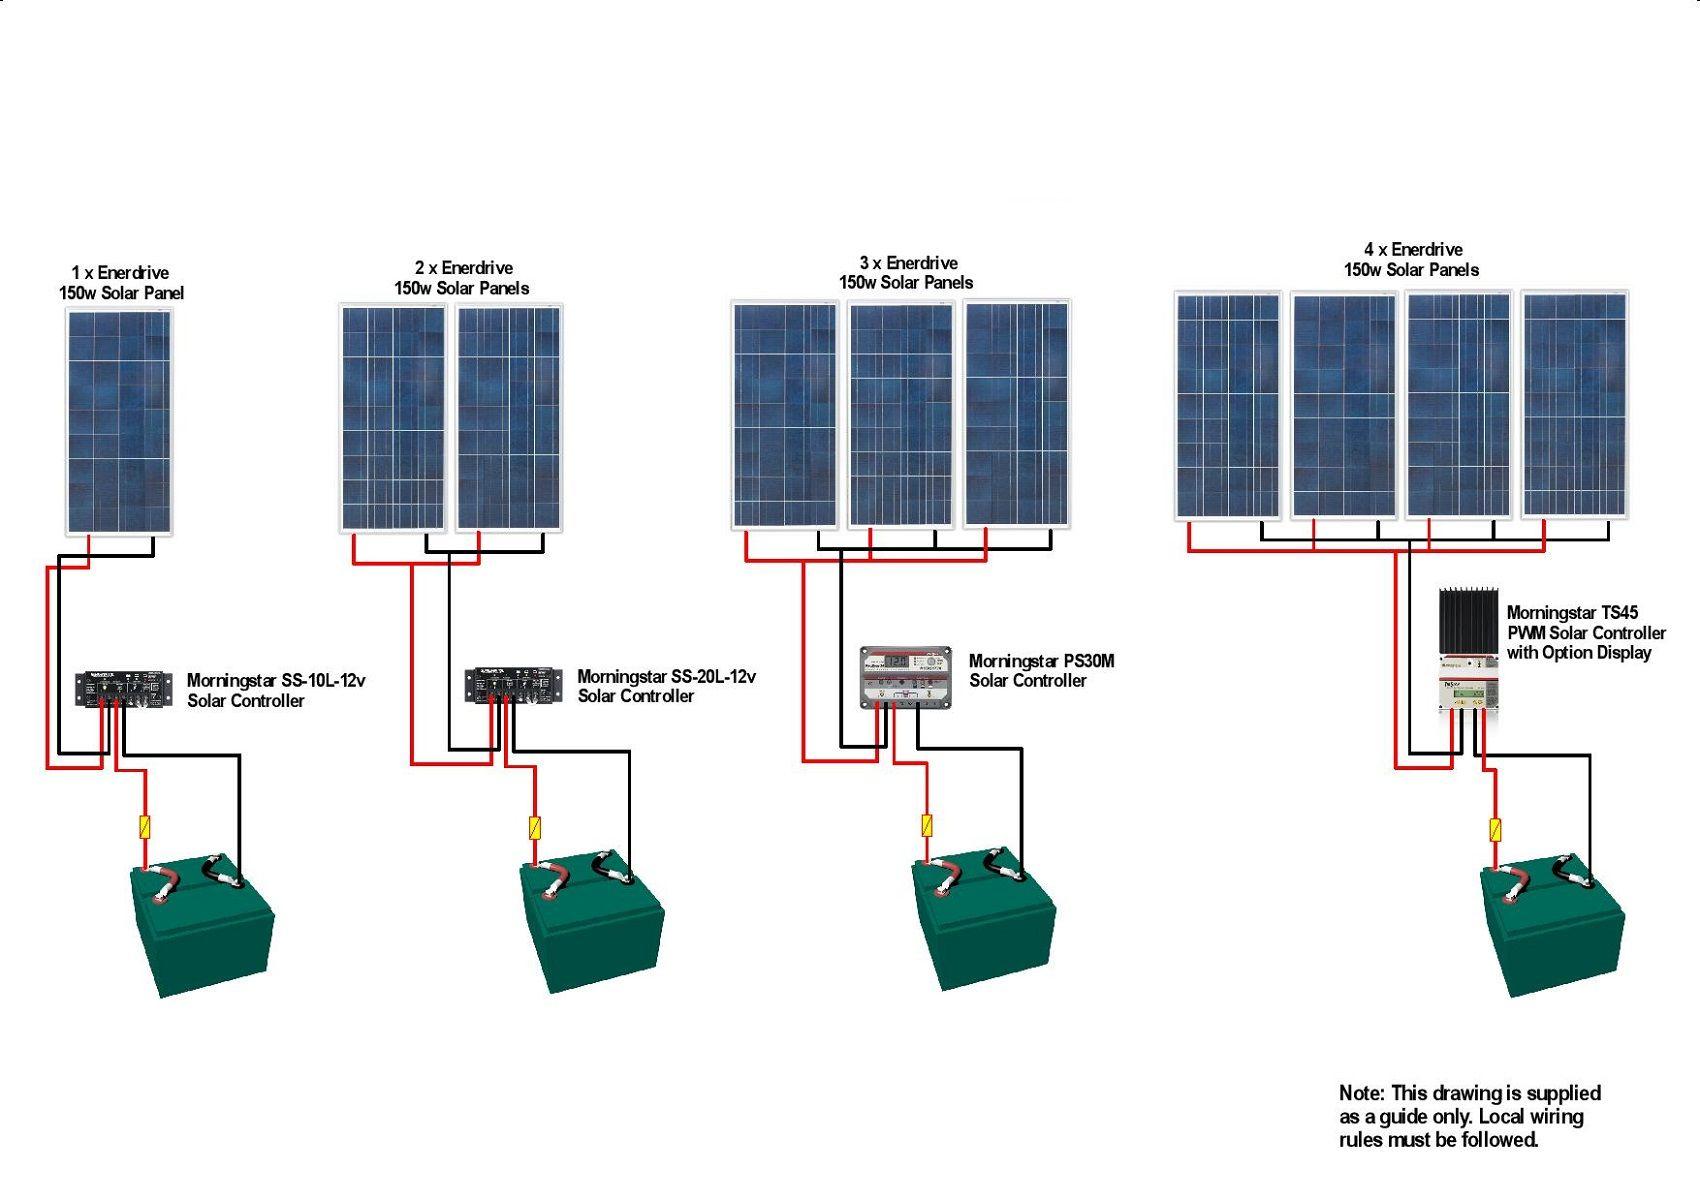 Kv 5030 Solar Panel House Diagram Solar Panel Diagrams